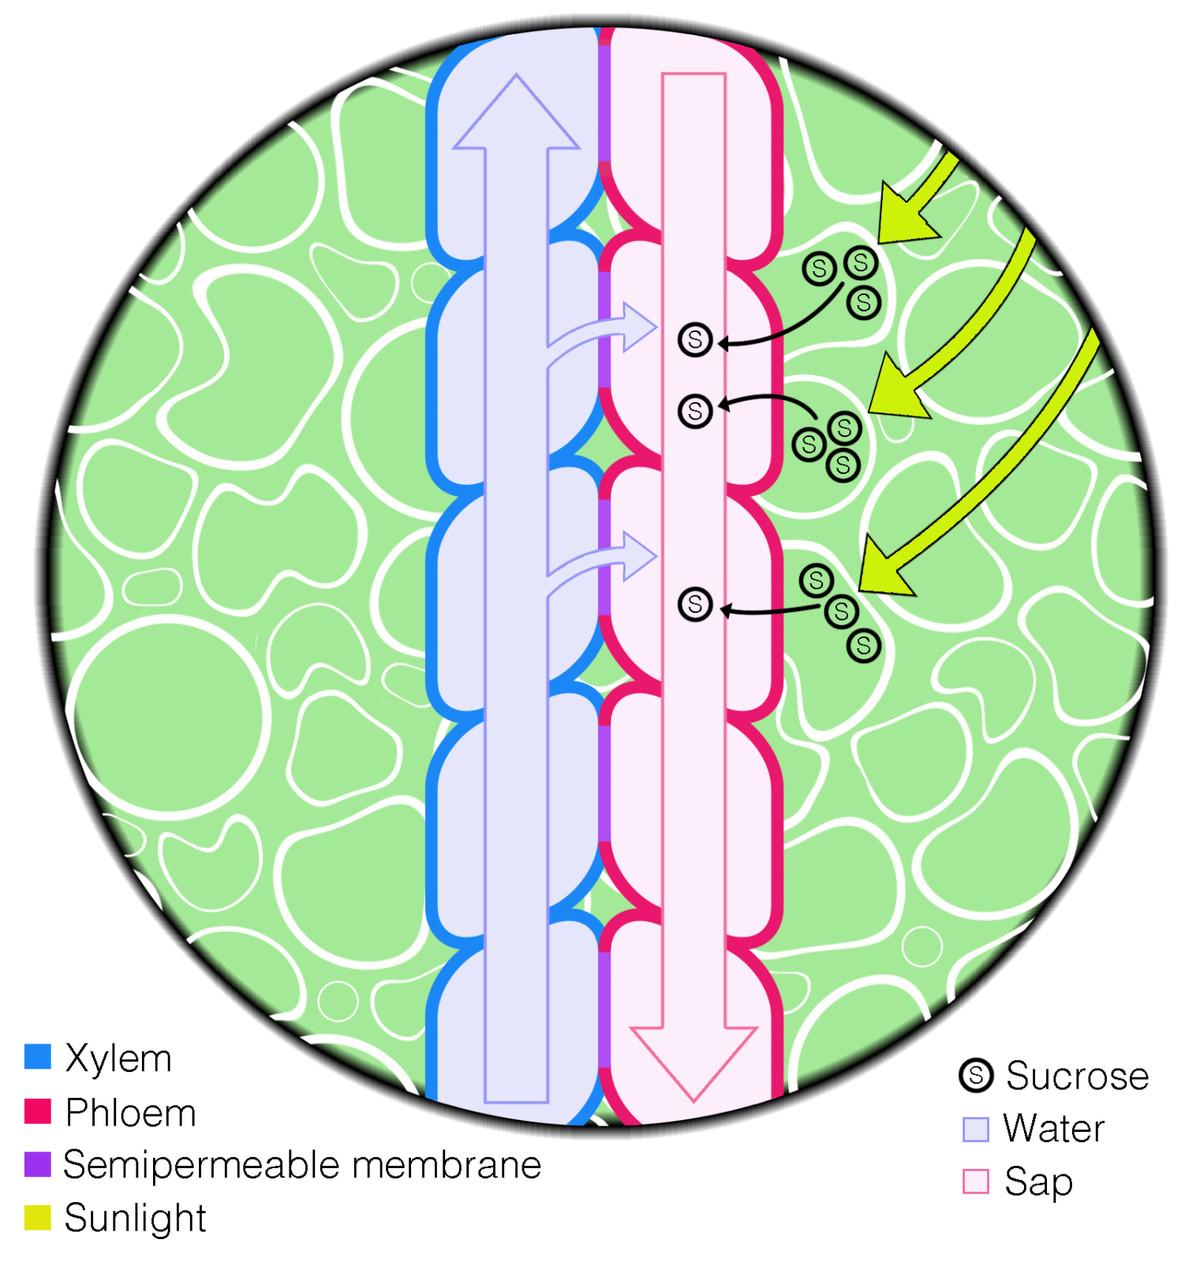 Energy Phloe M I